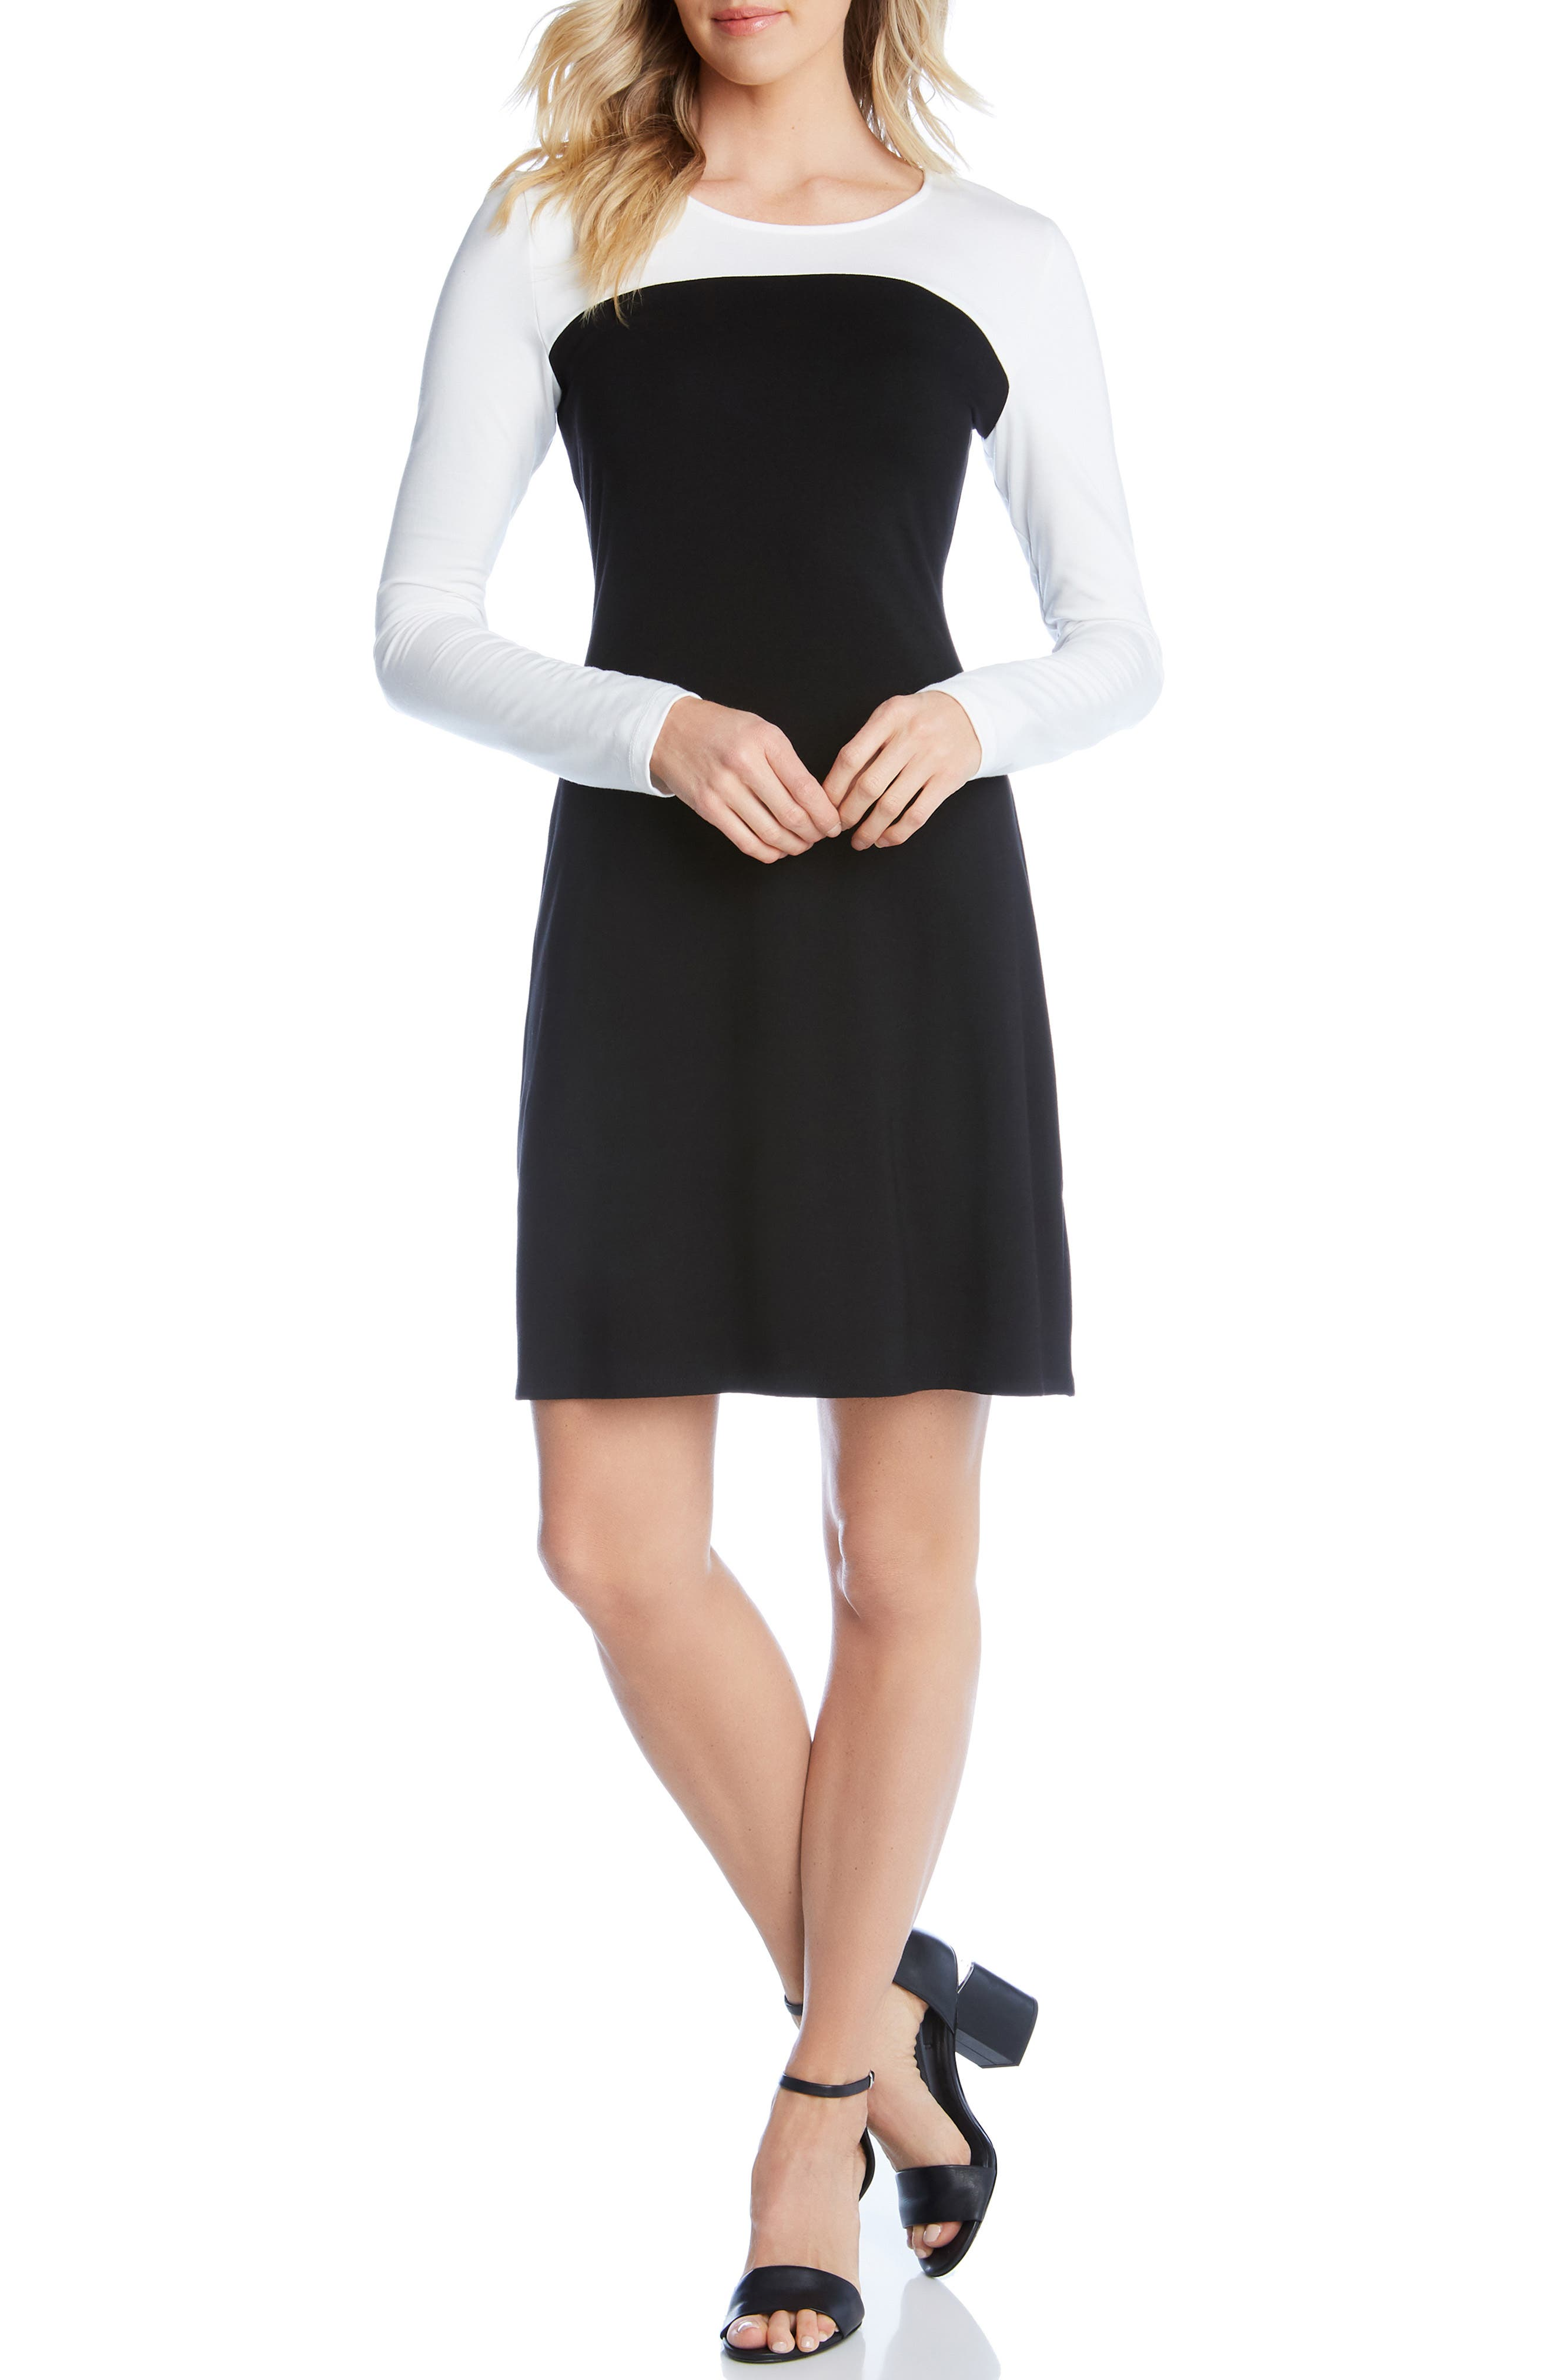 KAREN KANE Colorblock Sheath Dress, Main, color, BLACK WITH OFF WHITE